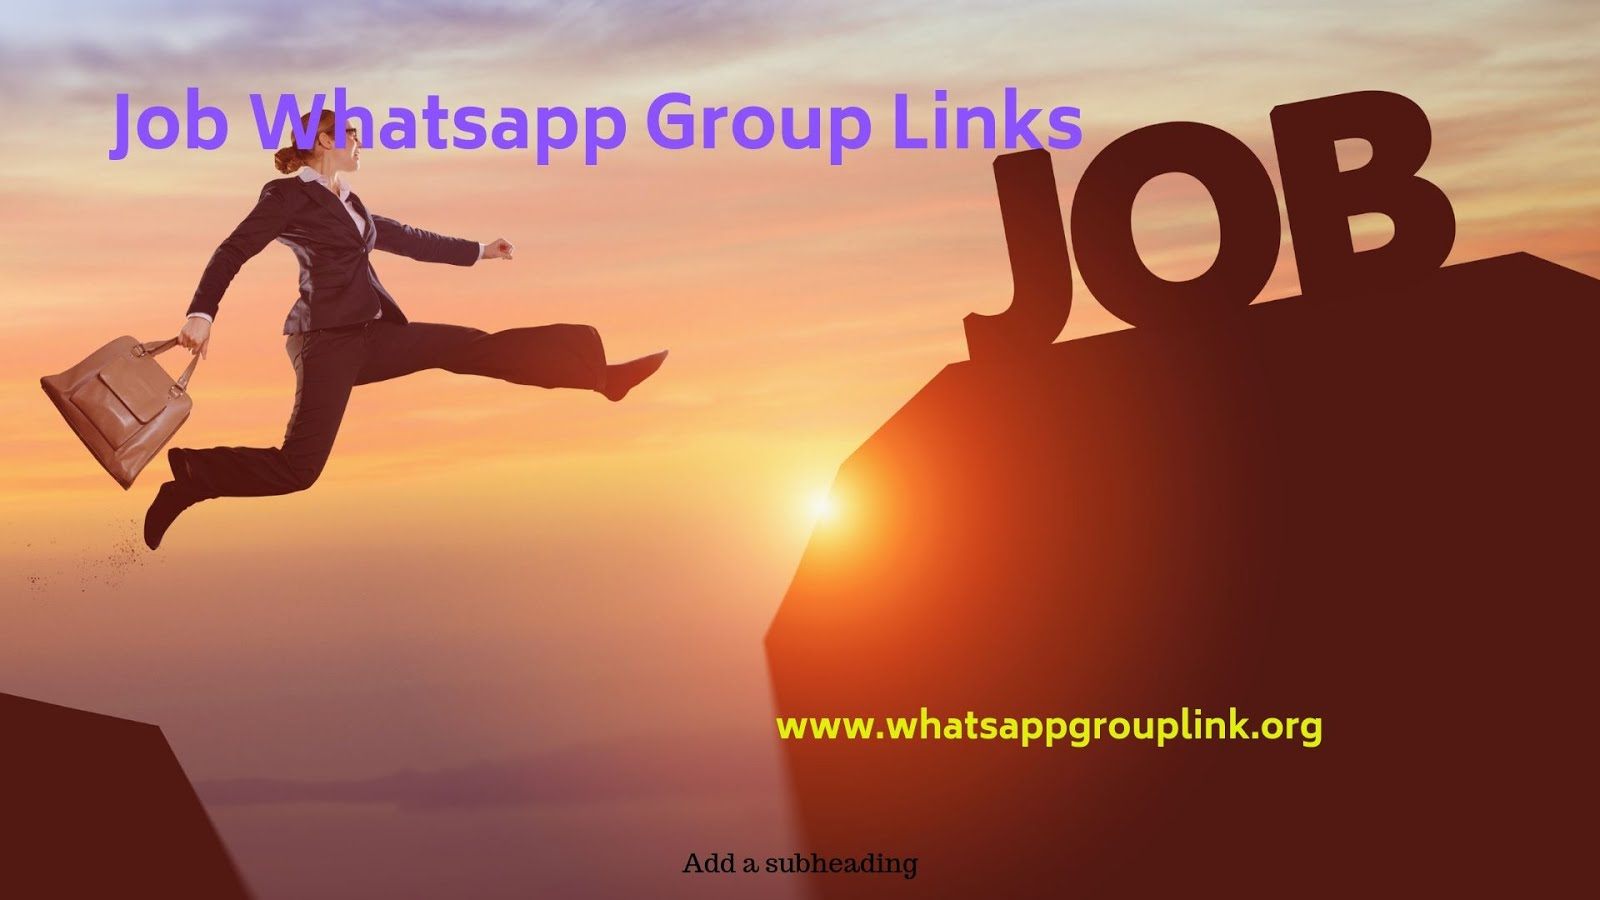 Whatsapp Group Link: Jobs Whatsapp Group Links